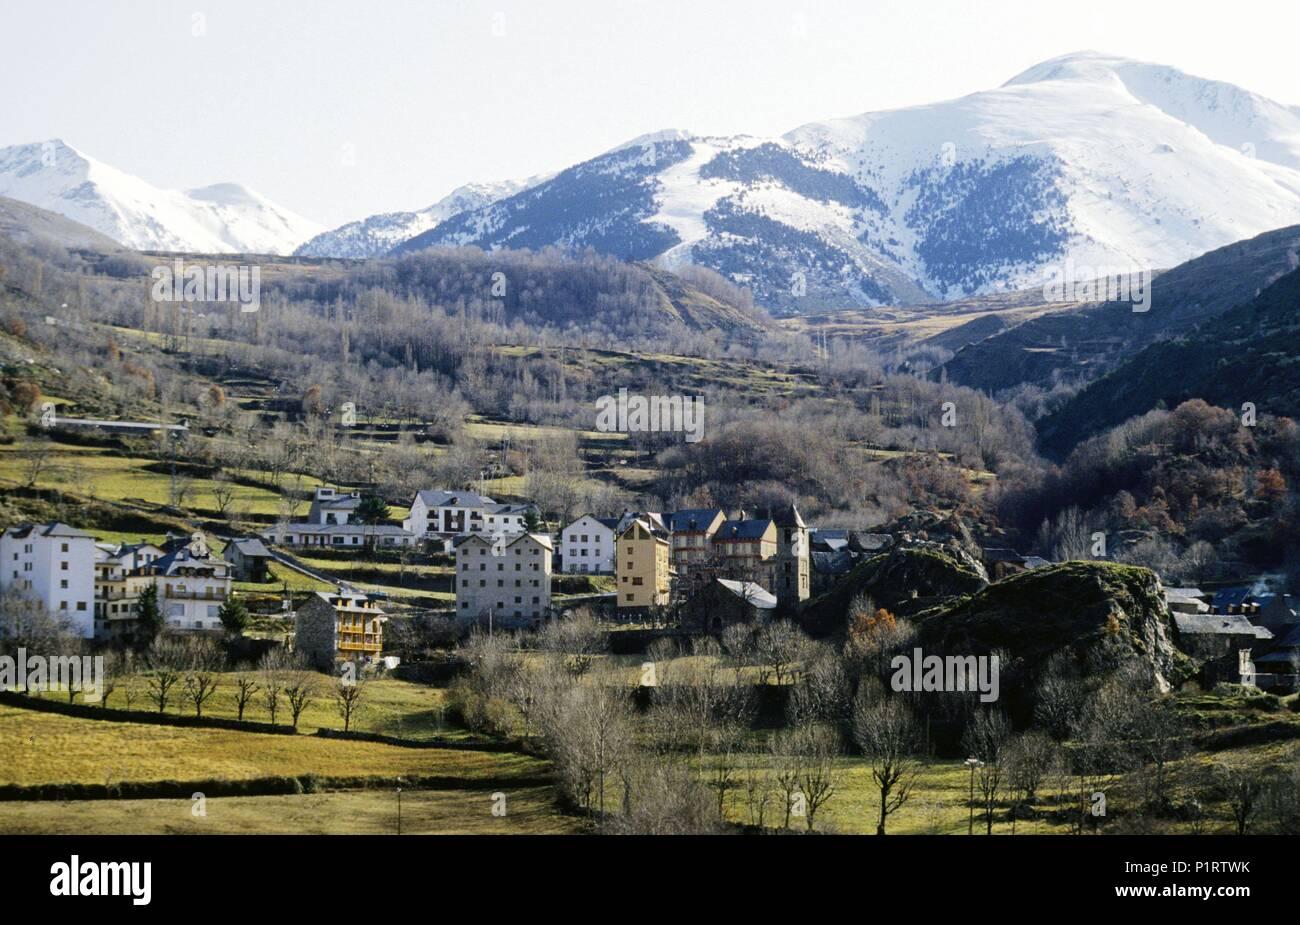 Alta Ribagorça: Valle (valley) del Boí, view of Boí town and landscape (Alta Ribagorça). - Stock Image